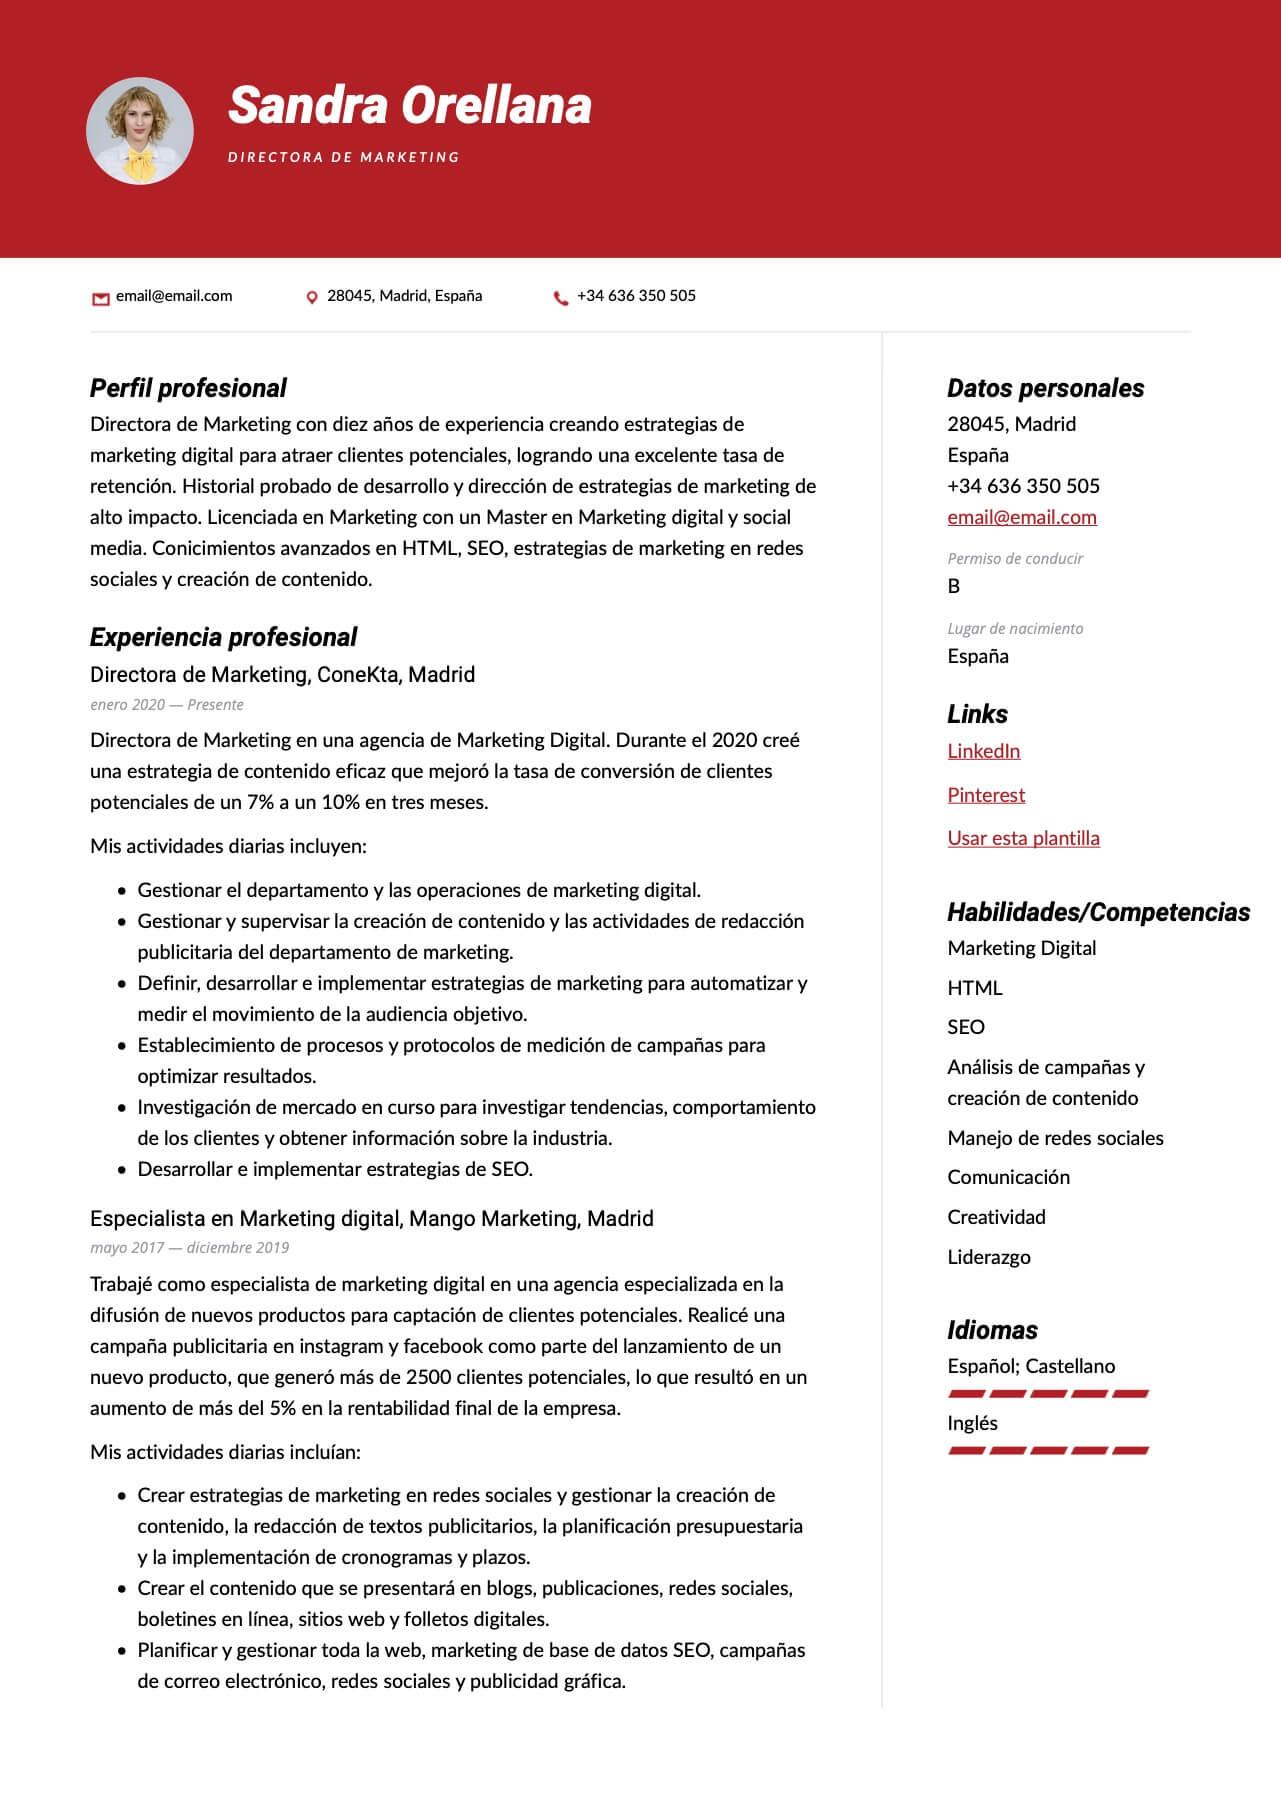 Modelo de CV para Director de marketing digital